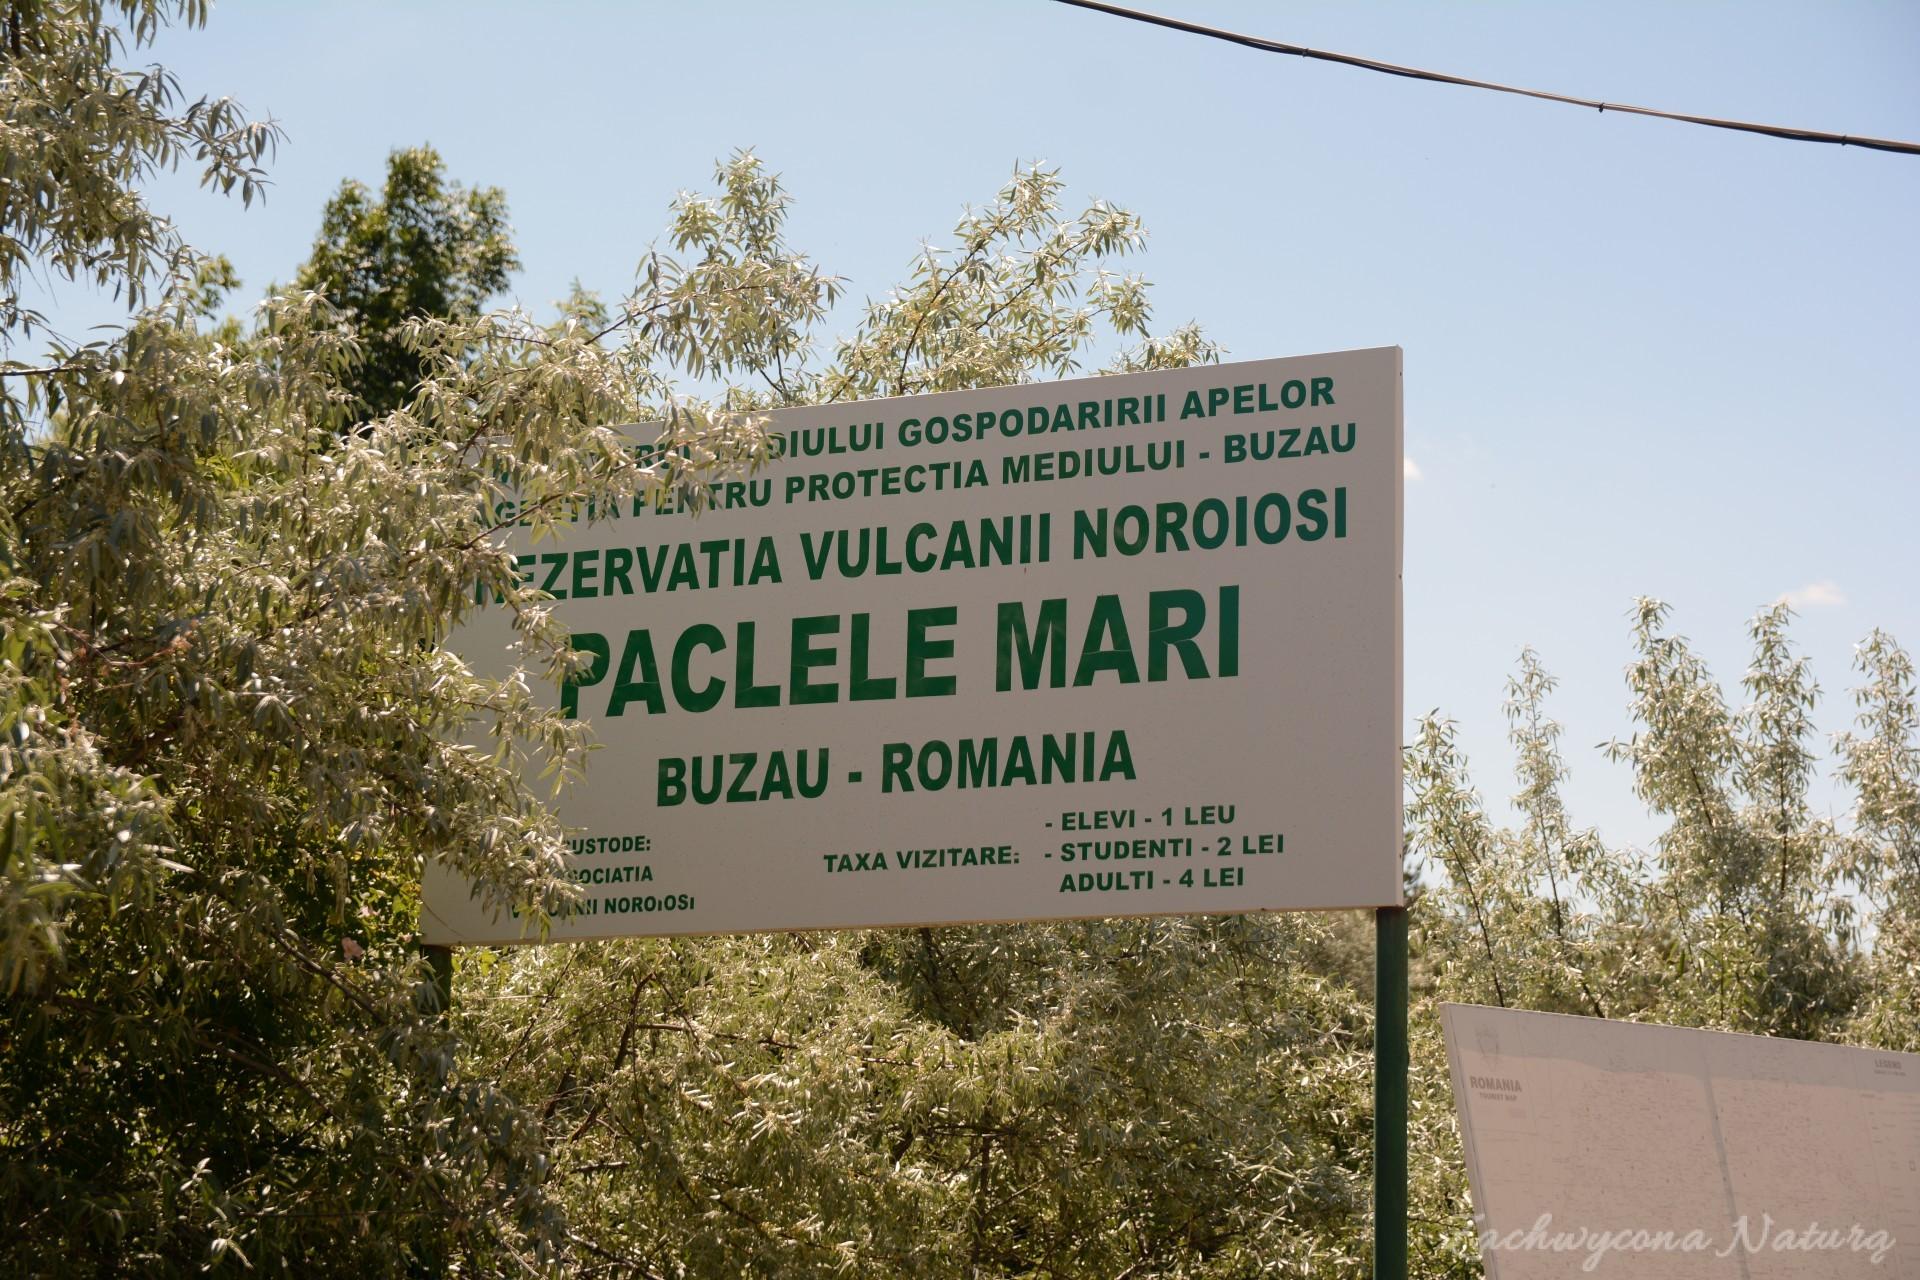 Wulkany B Otne W Rumunii Galeria Zachwycona Natur